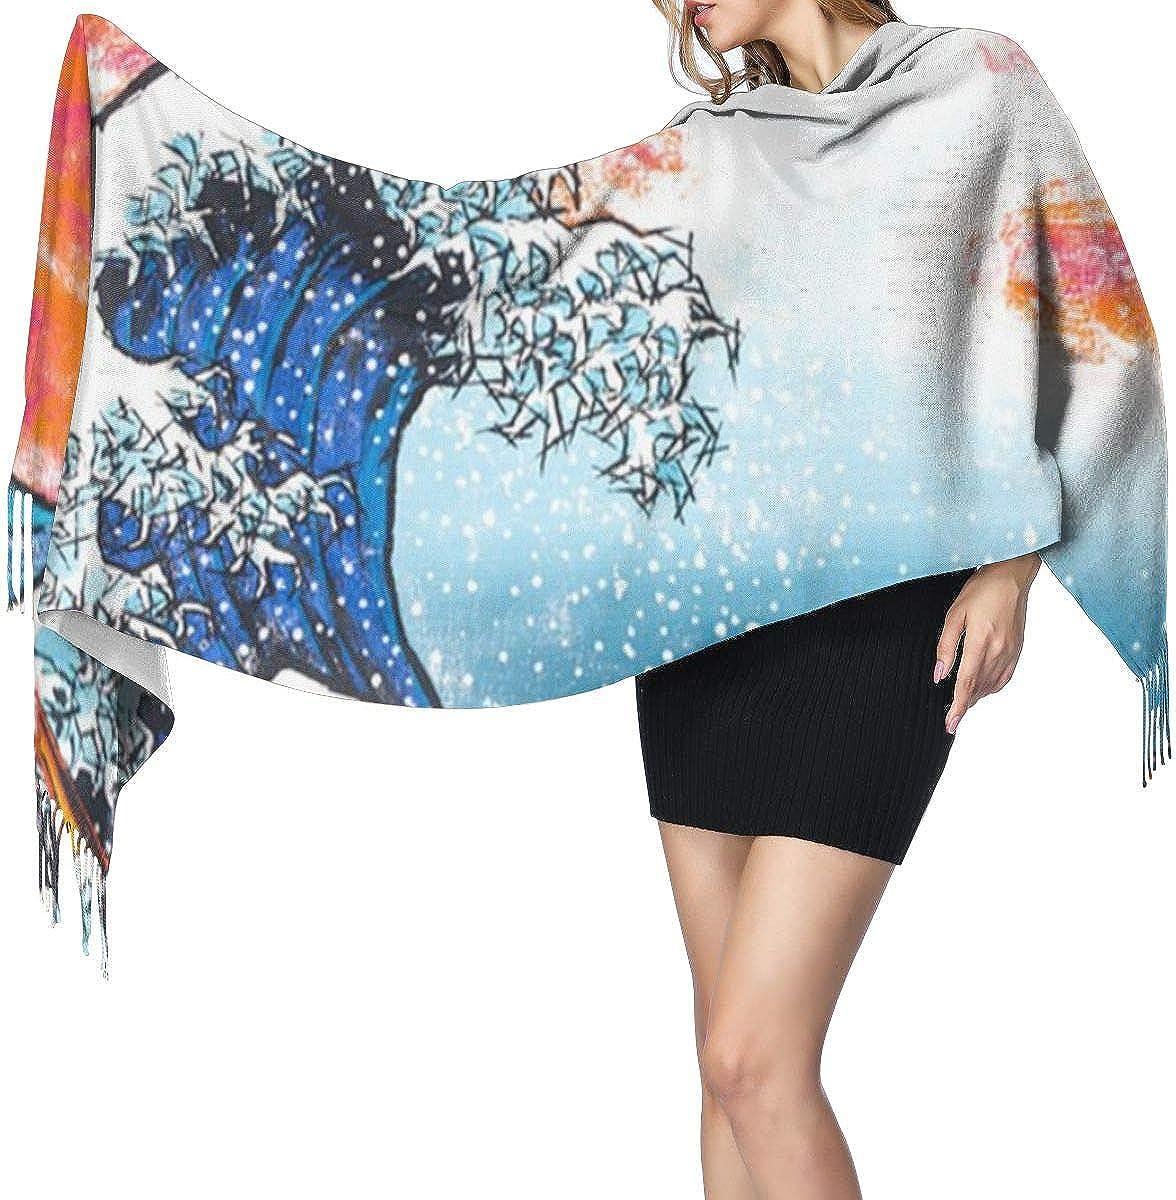 The Great Wave Off Kanagawa Women's Winter Warm Scarf Fashion Long Large Soft Cashmere Shawl Wrap Scarves